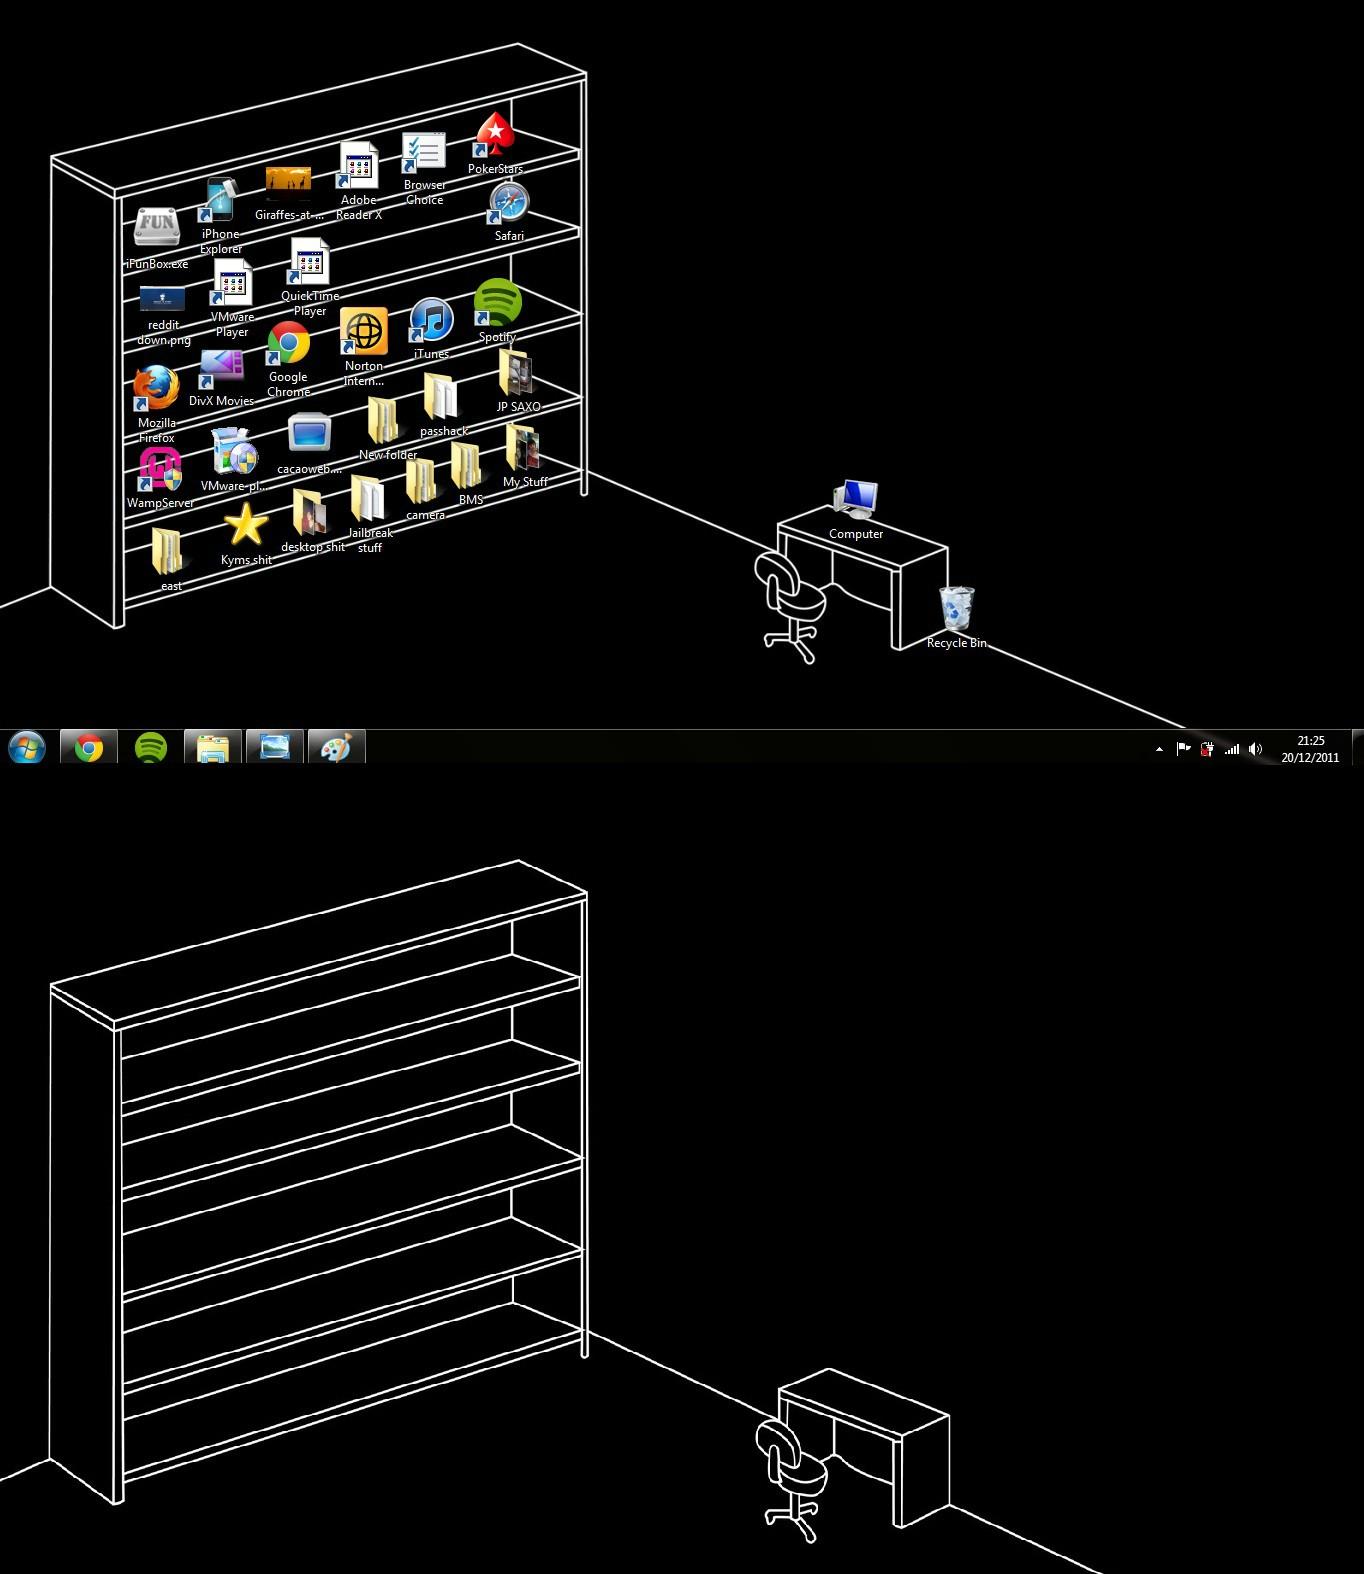 Best Windows Wallpaper Ever Wallpapersafari: Best Desktop Wallpaper Ever